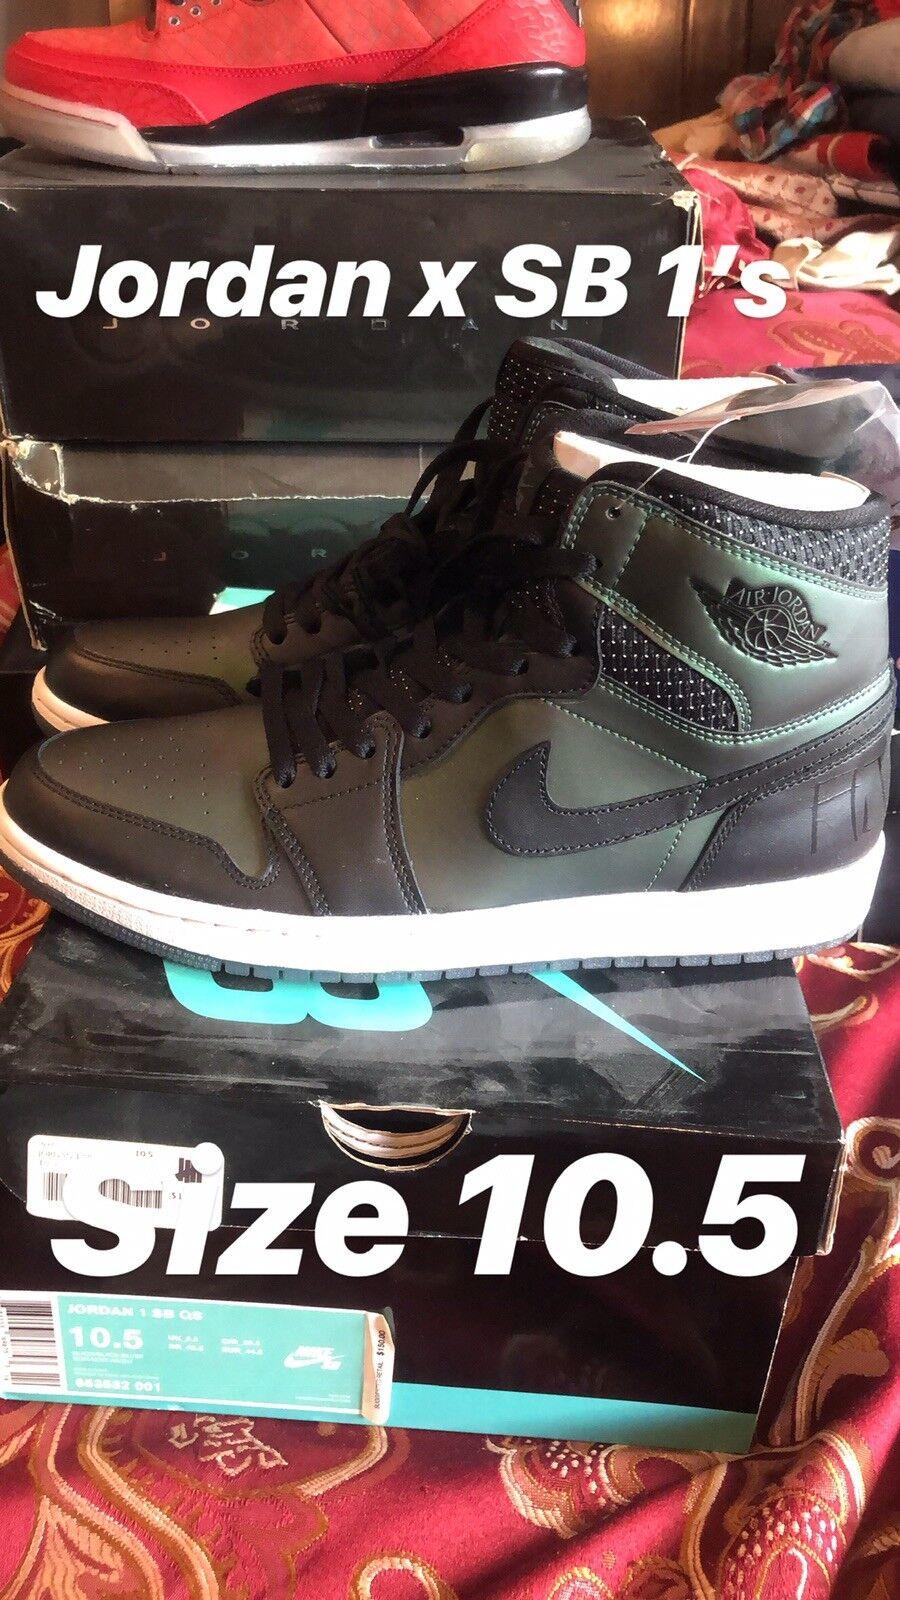 Nike Air Jordan 1 SB QS Black Black-Silver Size 10.5 653532-001 NEW